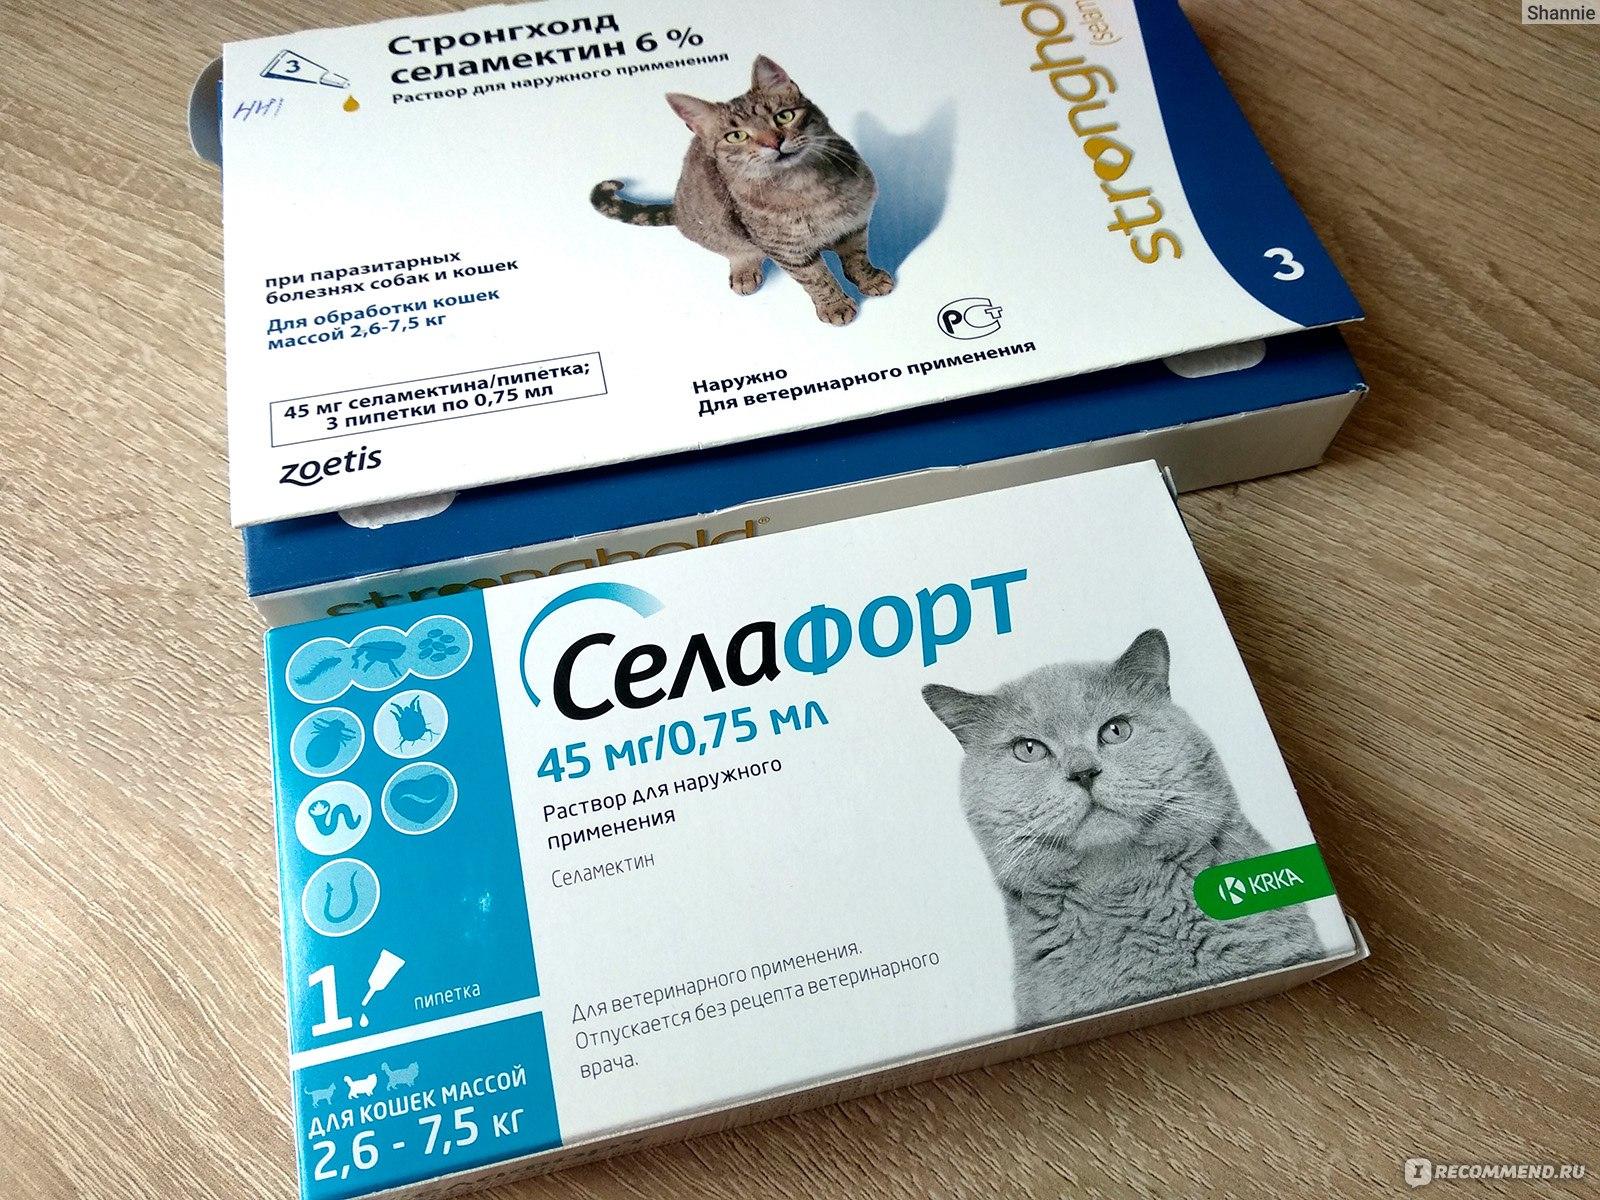 Обзор ветеринарного препарата стронгхолд